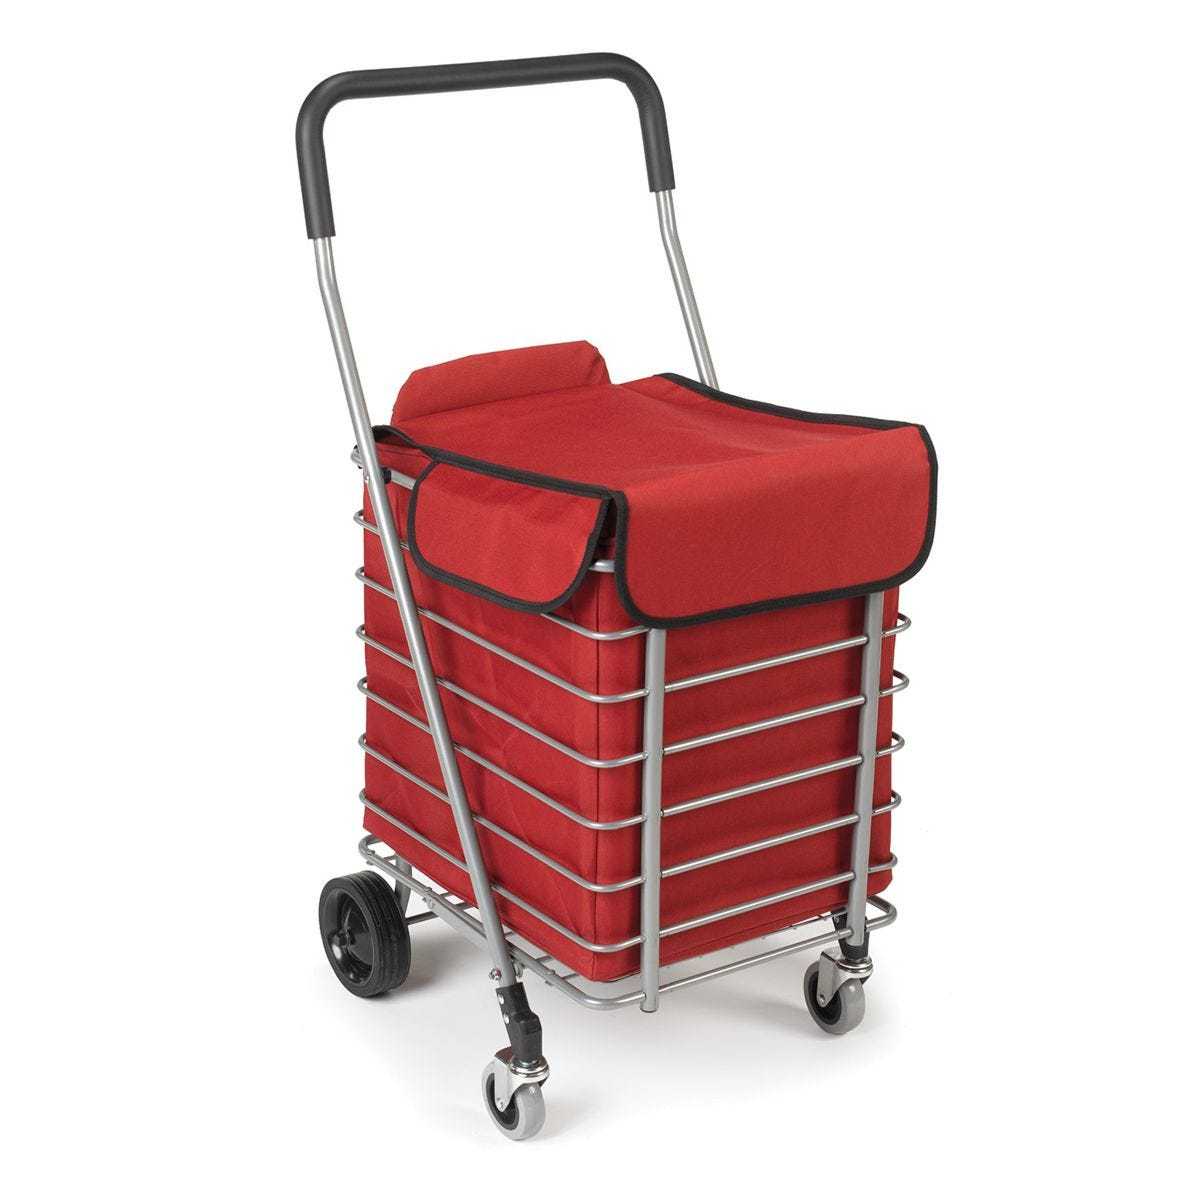 Polder Trolley Insert Bag